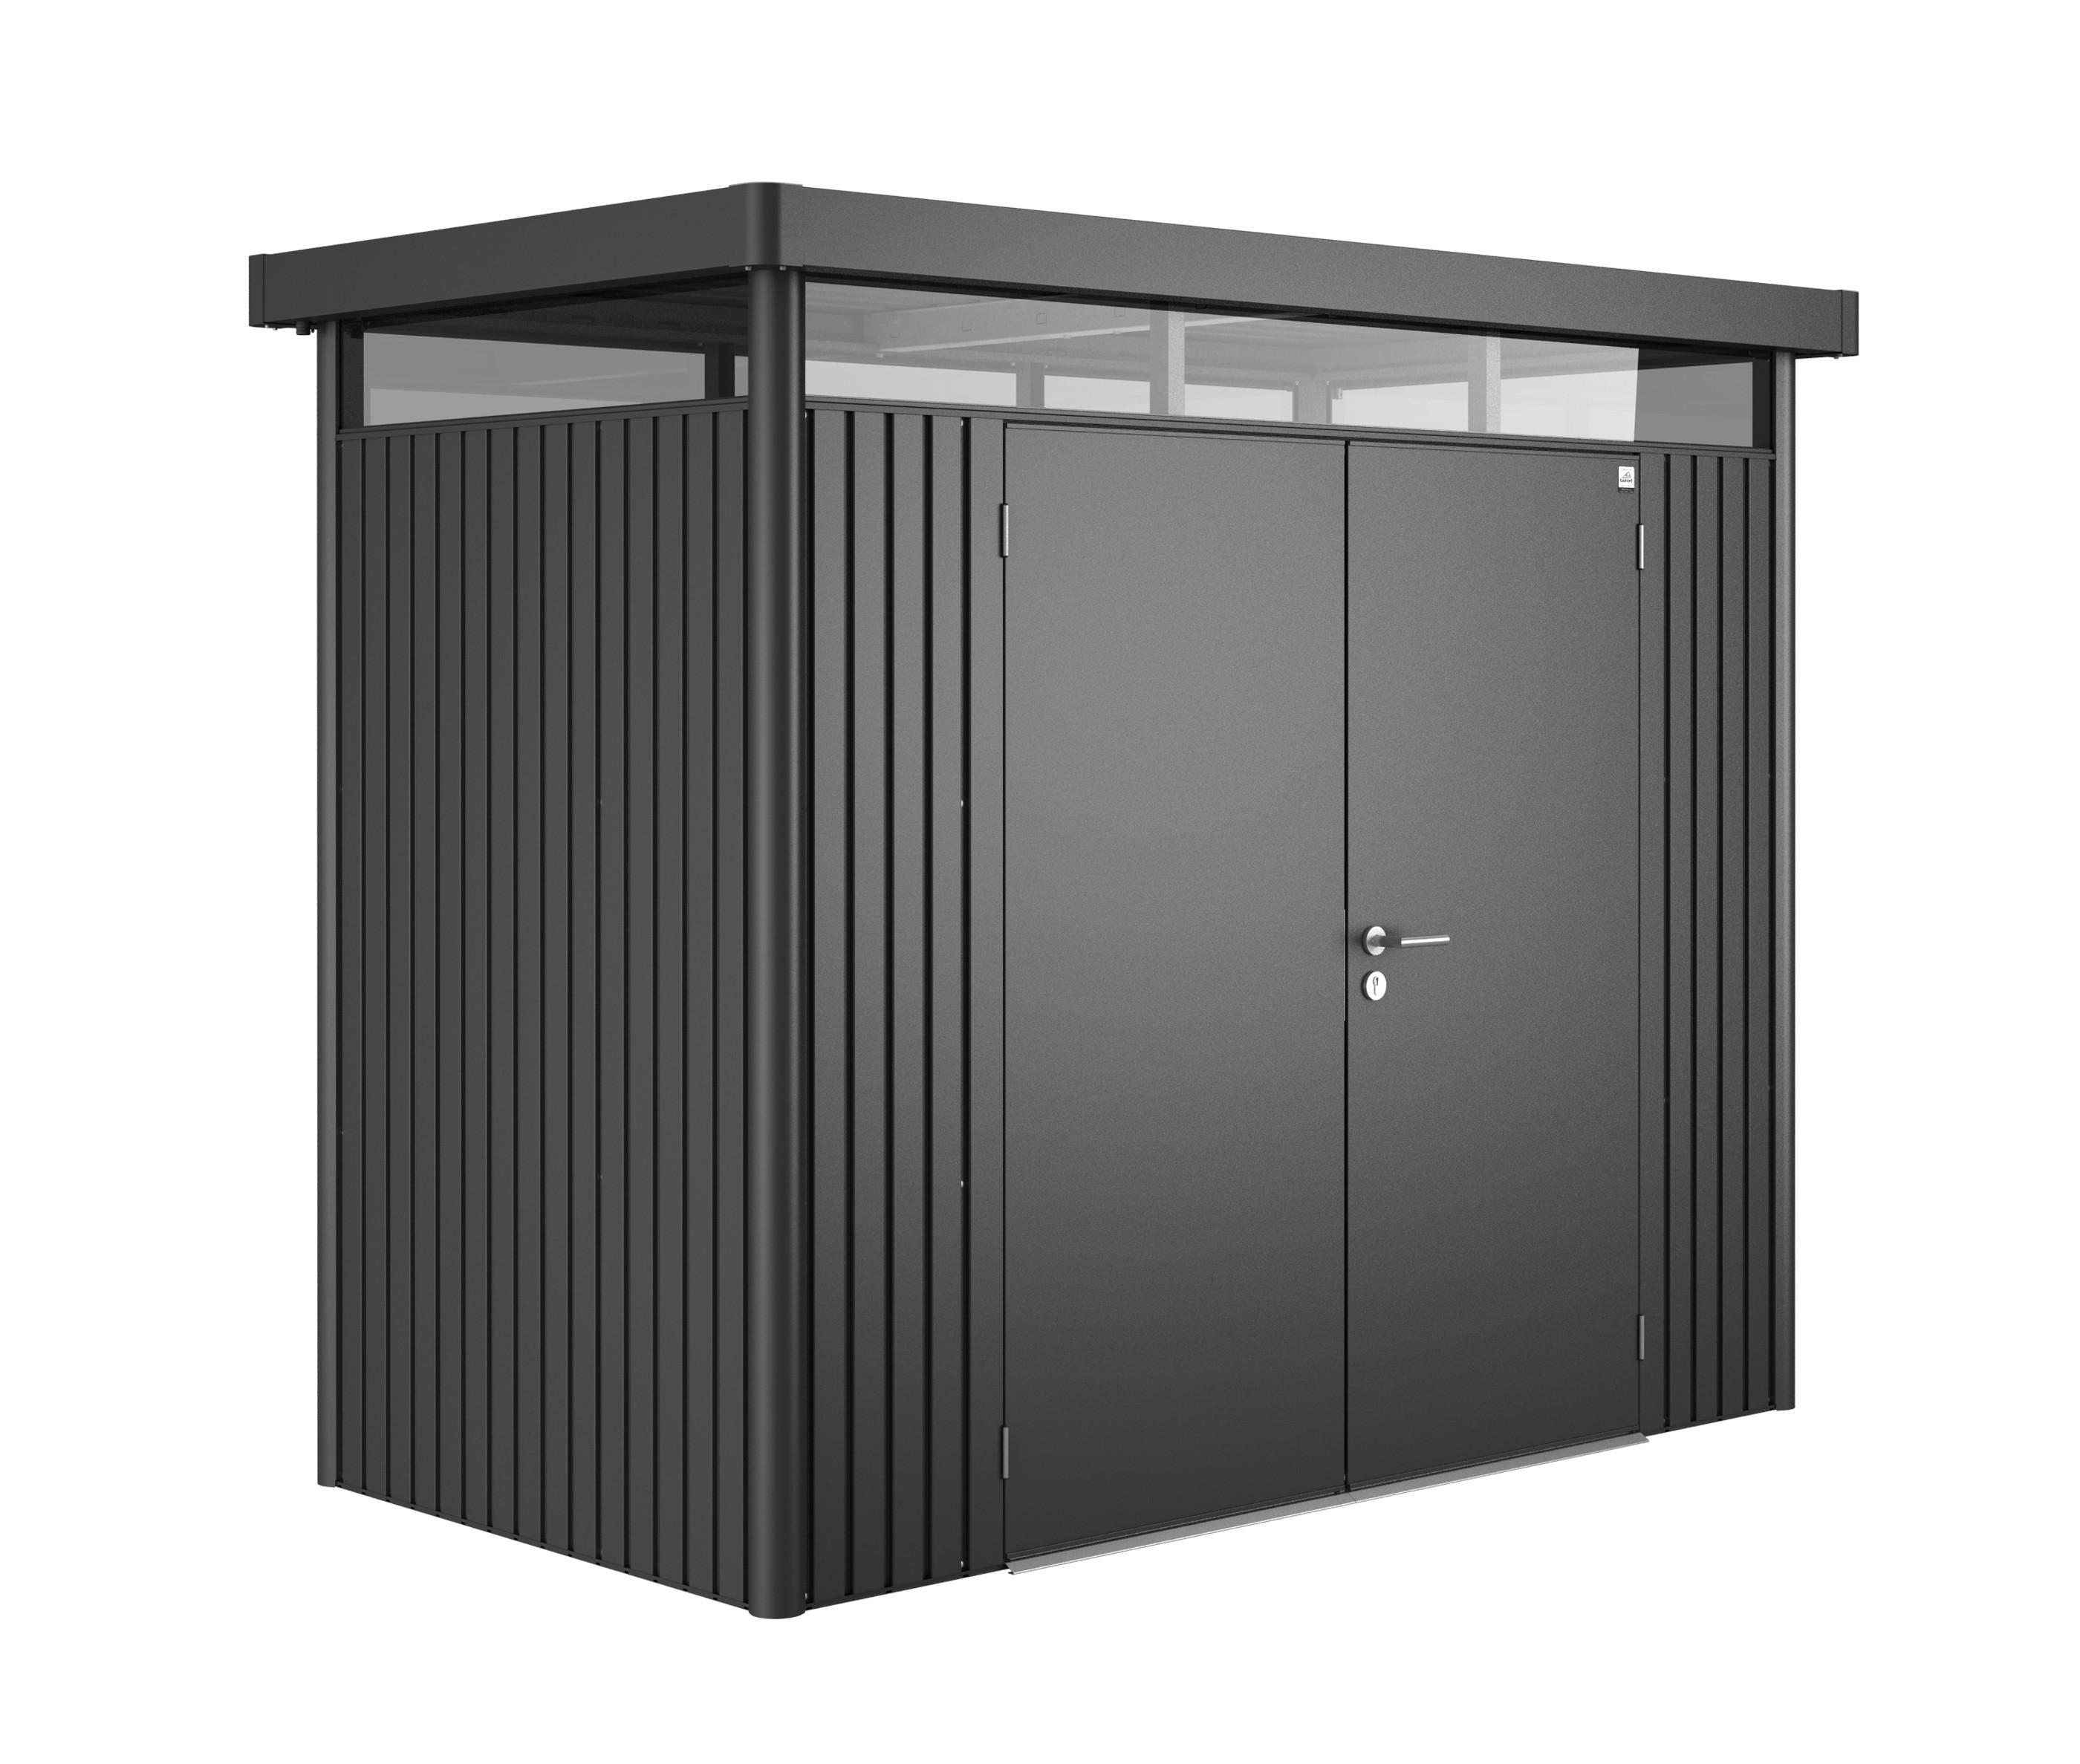 ger tehaus biohort highline h1 dunkelgrau metallic dt 275x155x222cm bei. Black Bedroom Furniture Sets. Home Design Ideas